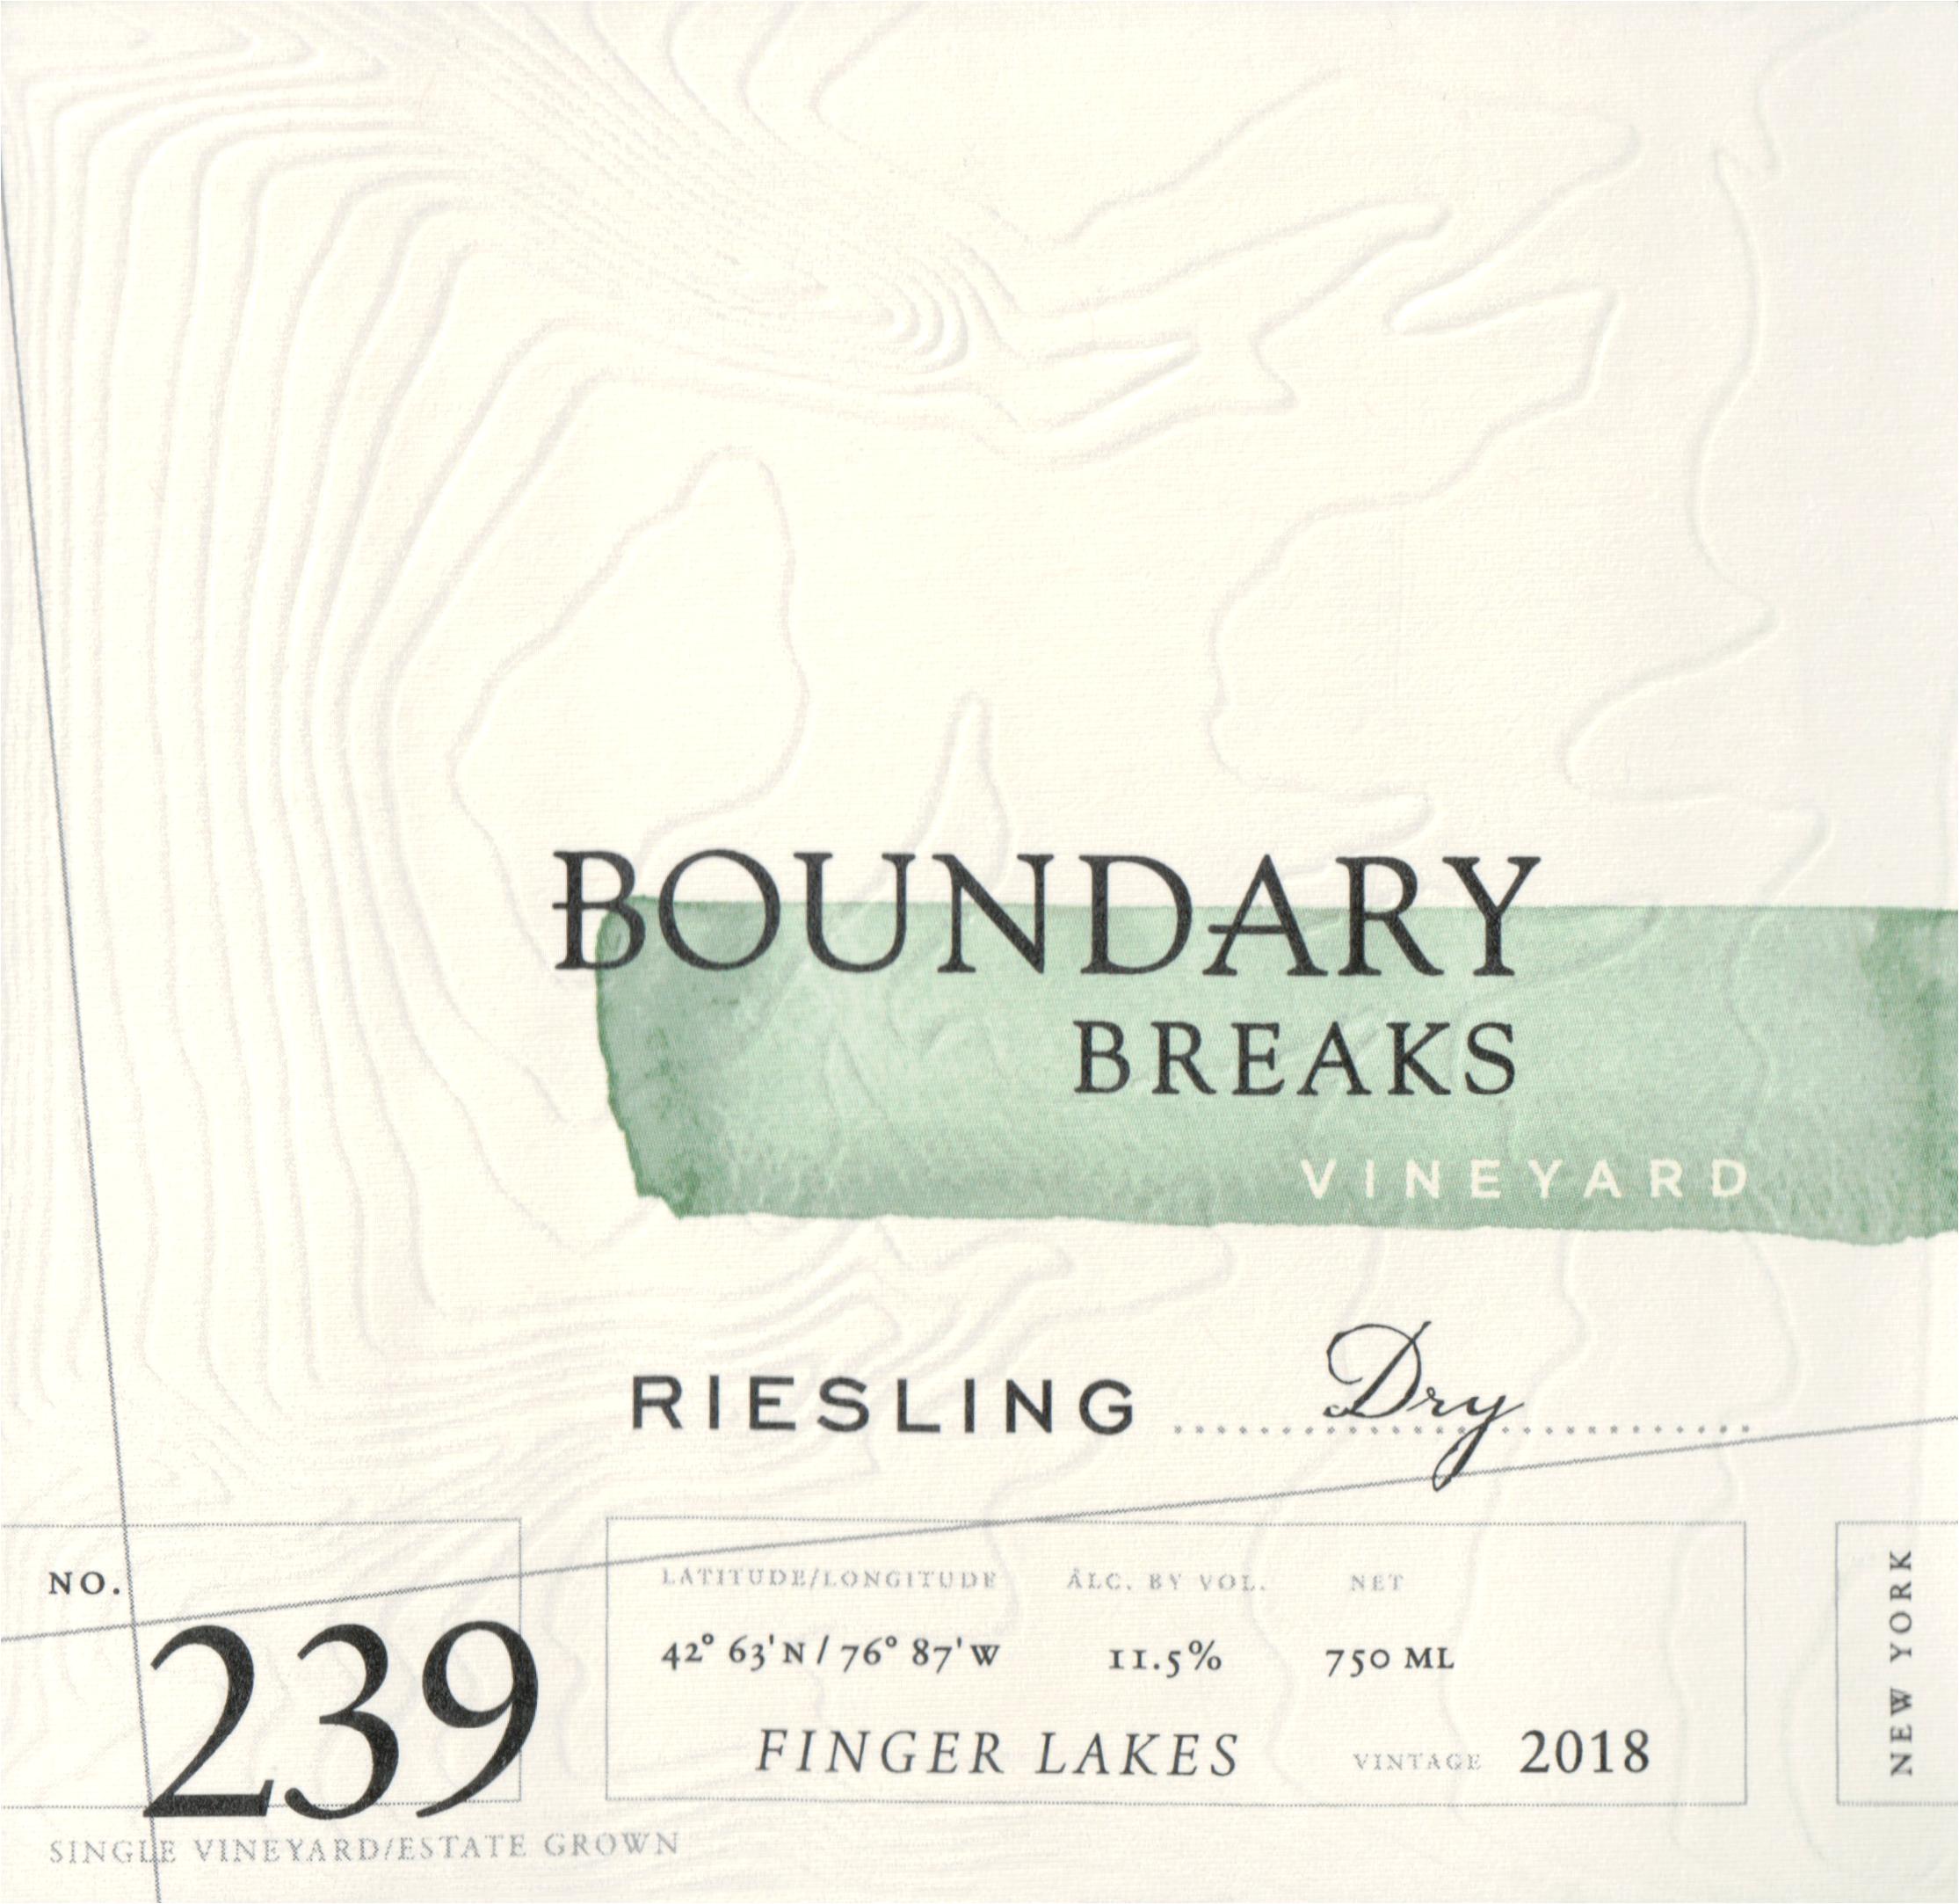 Boundary Breaks Riesling No. 239 2018